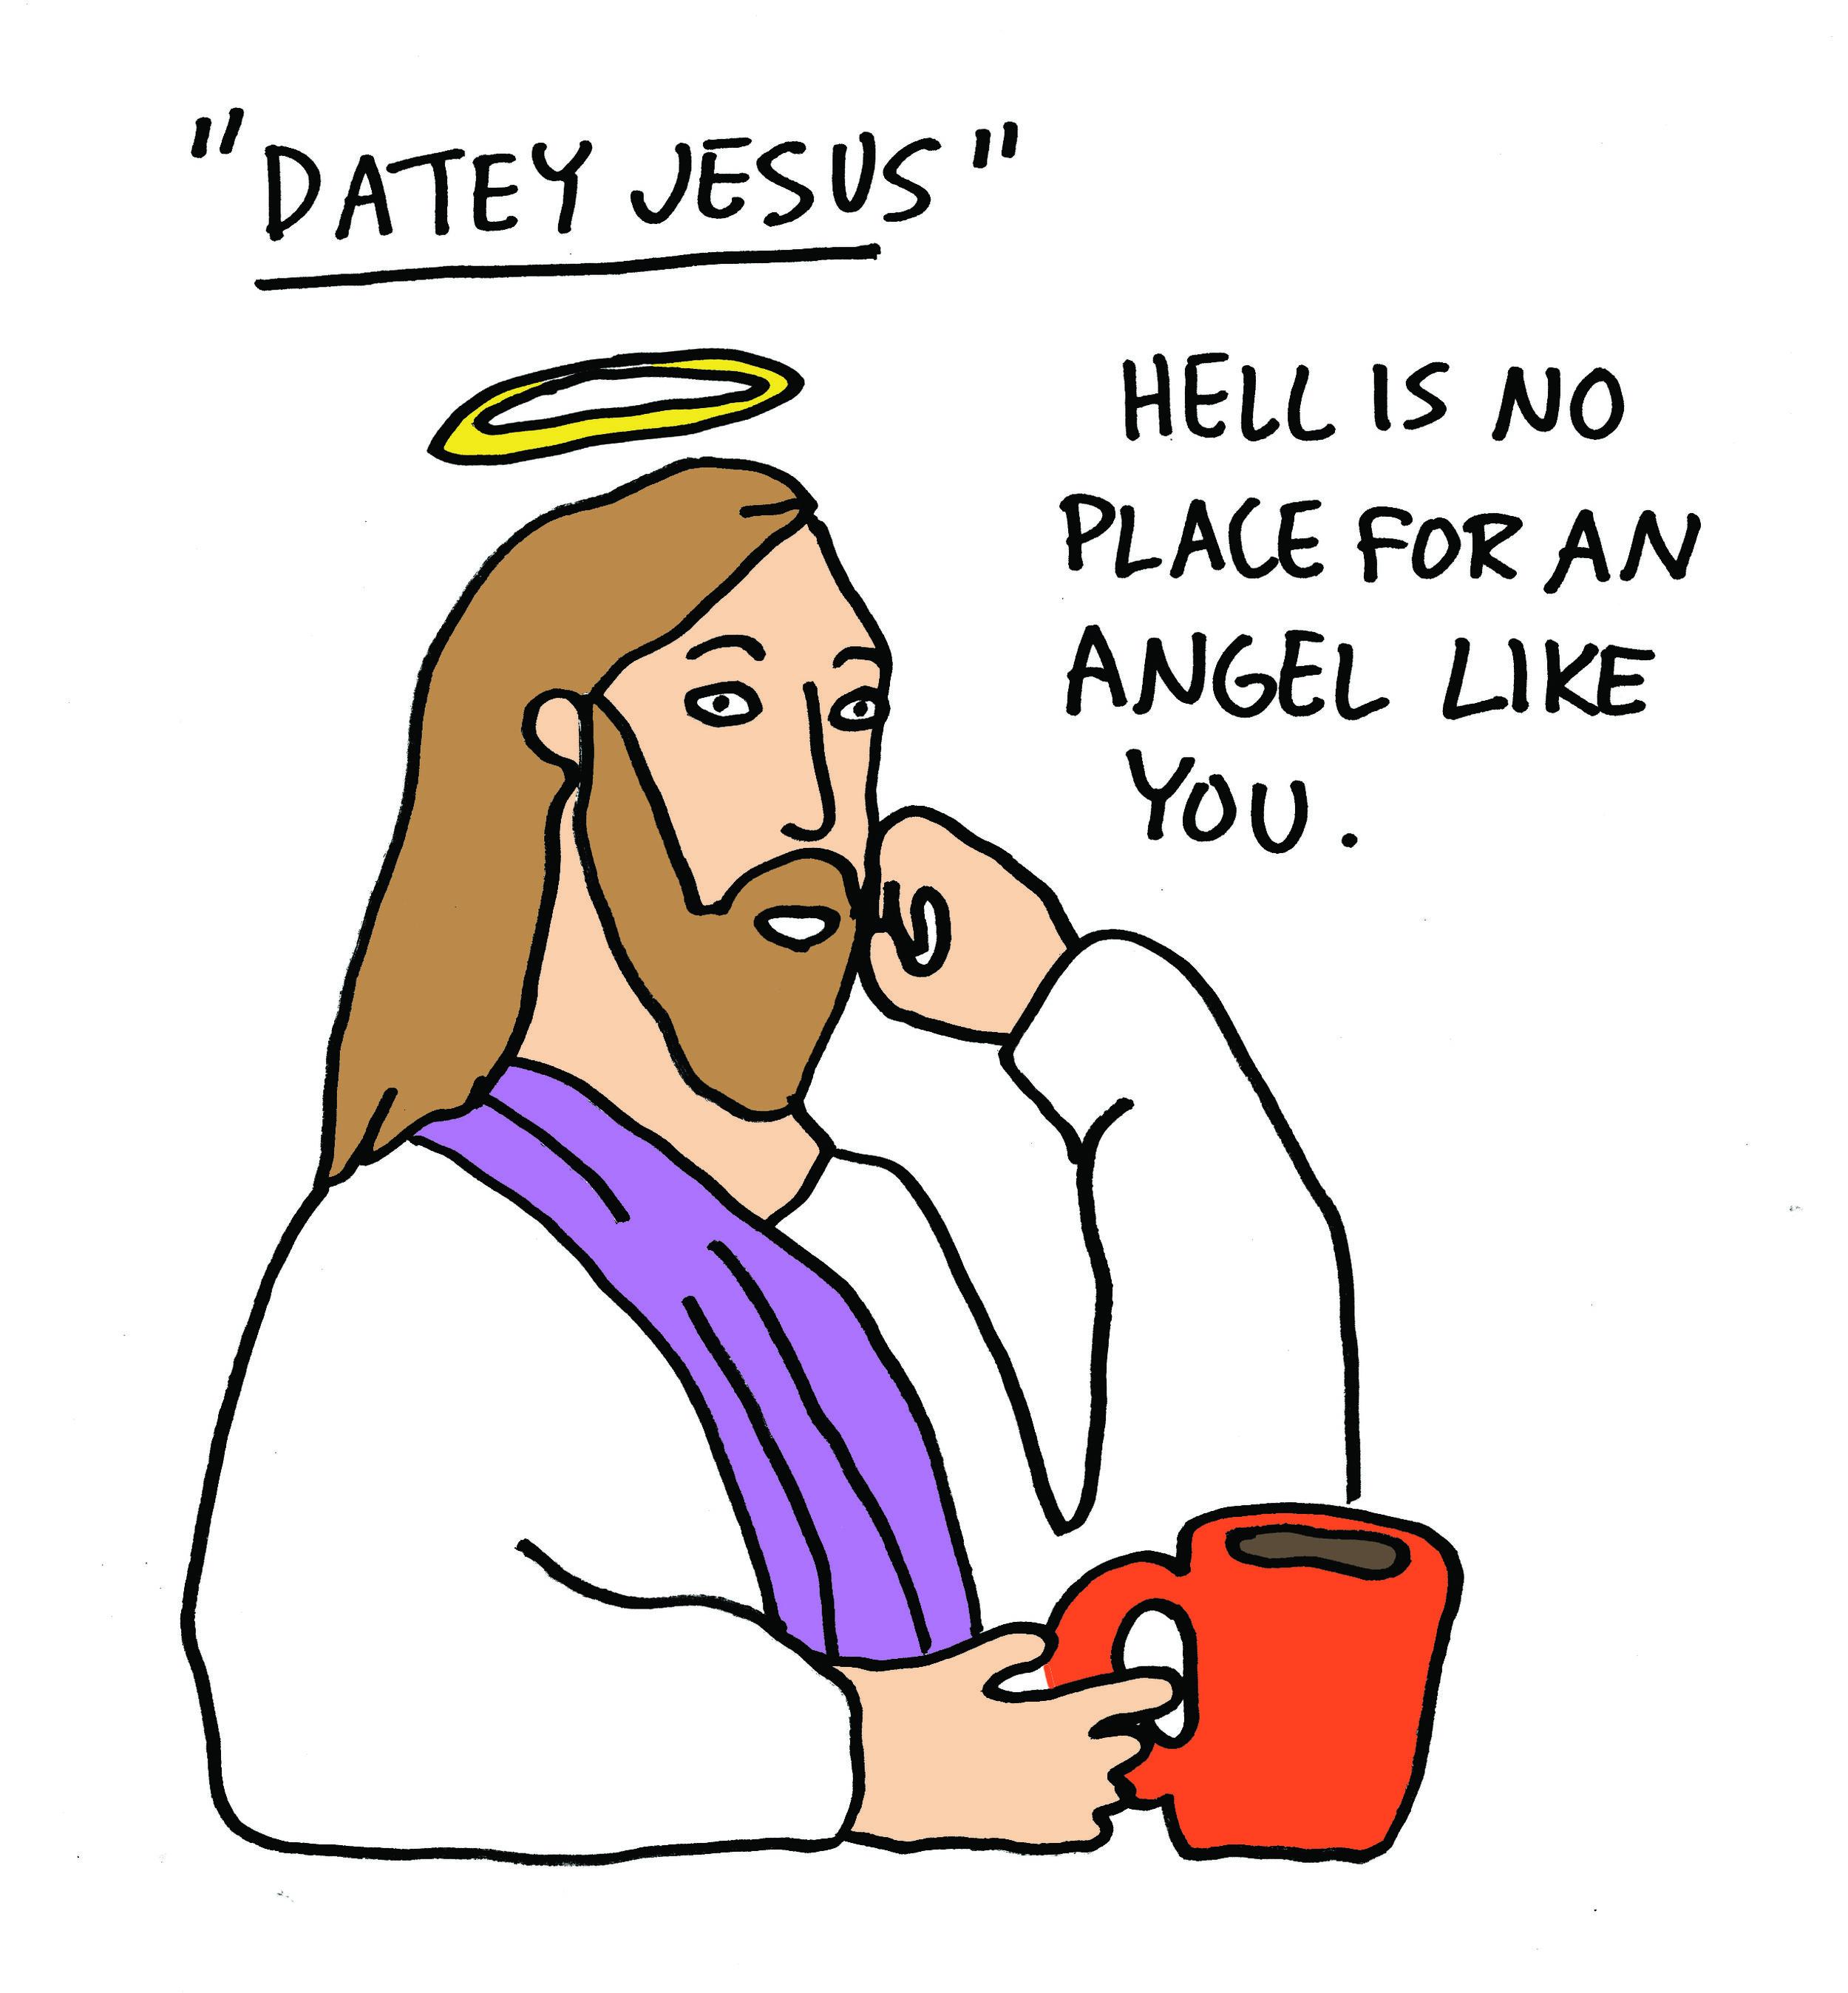 Datey Jesus